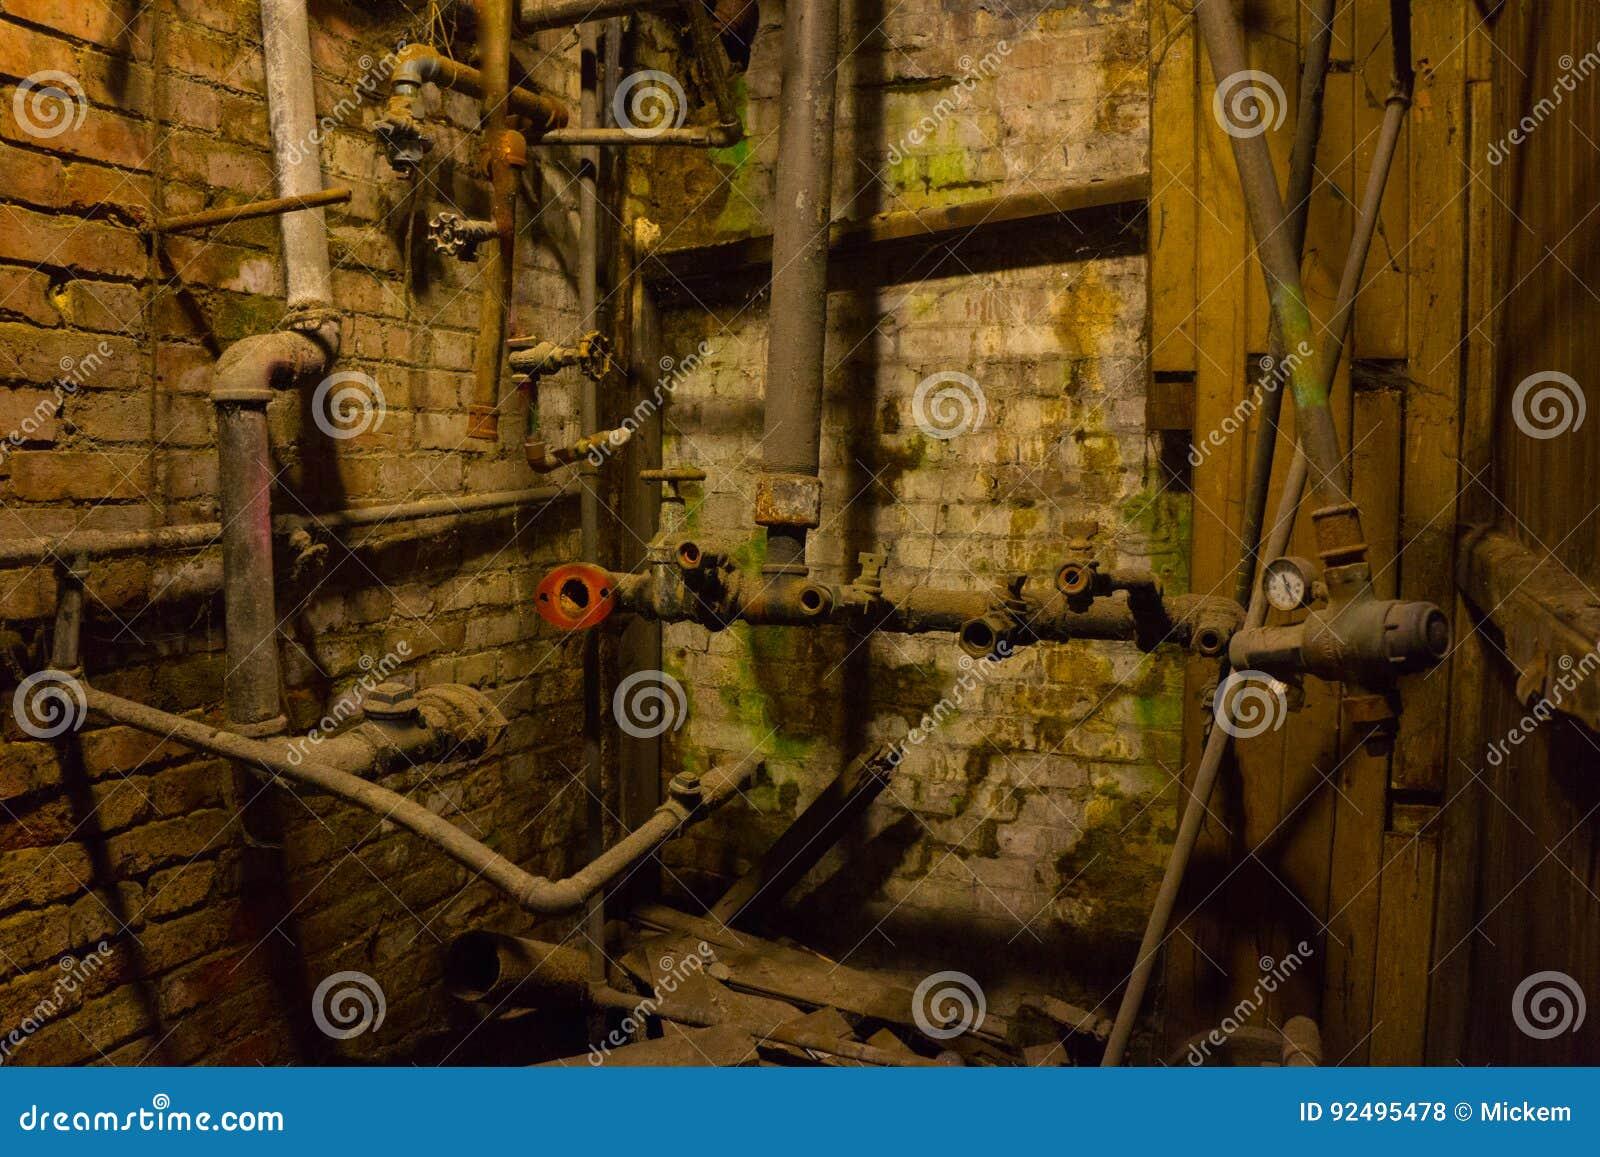 Abandoned Antique Plumbing stock photo. Image of equipment - 92495478